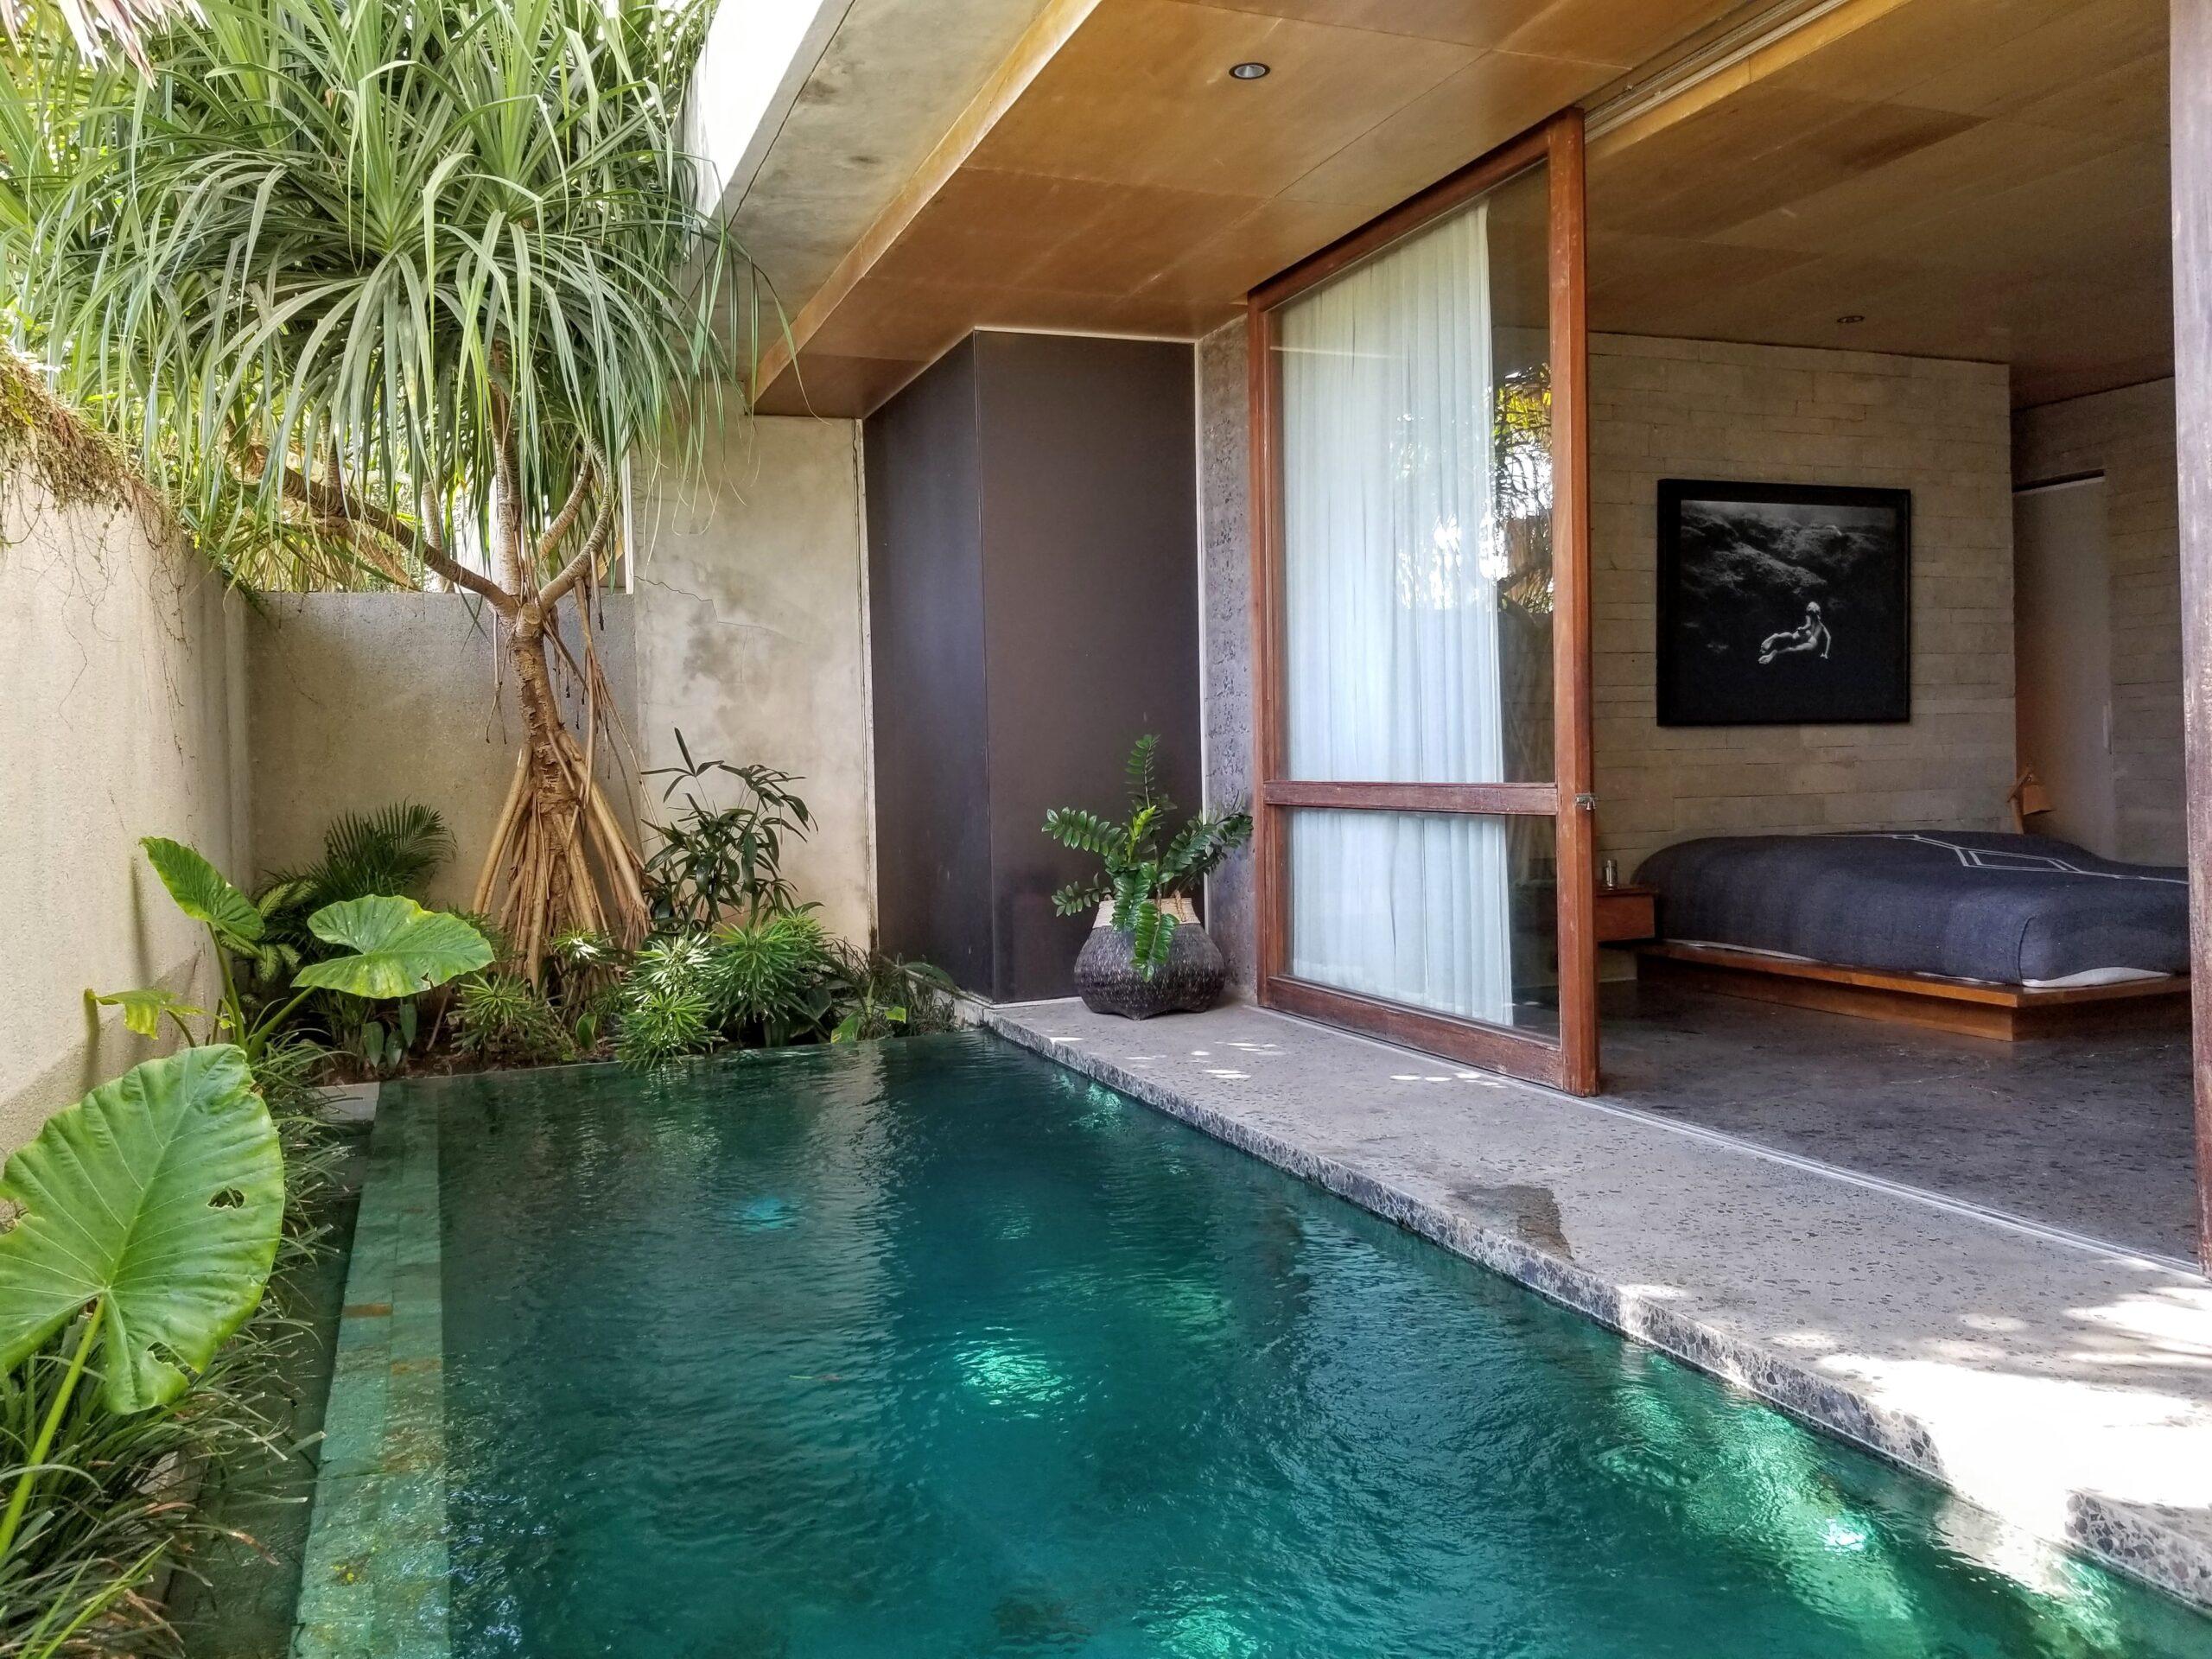 The Slow - Pool Villa